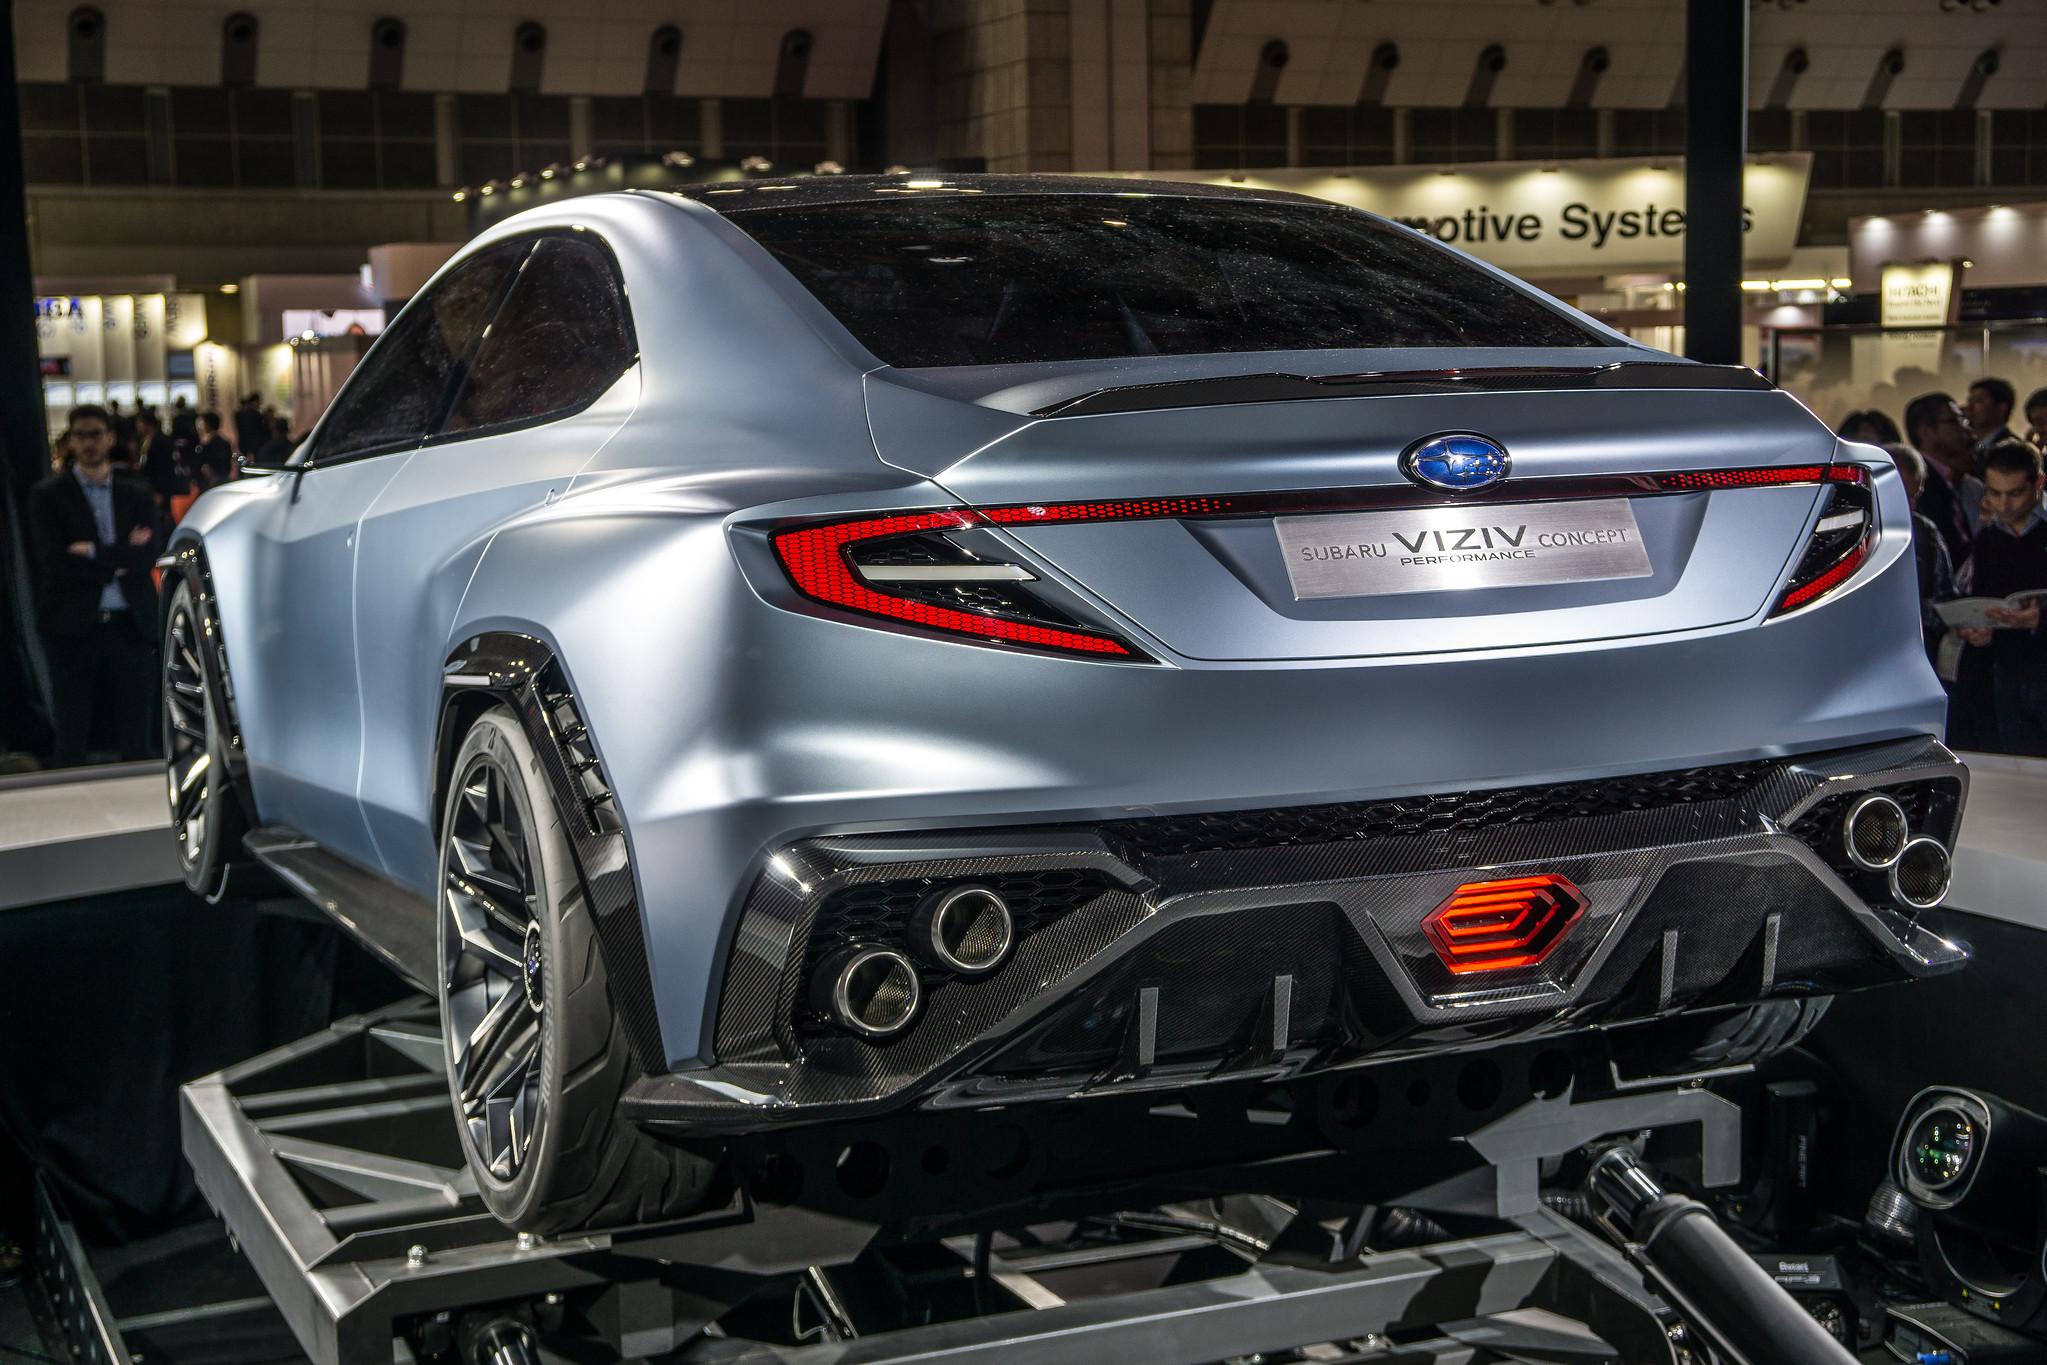 2017 subaru viziv performance concept tokyo auto salon